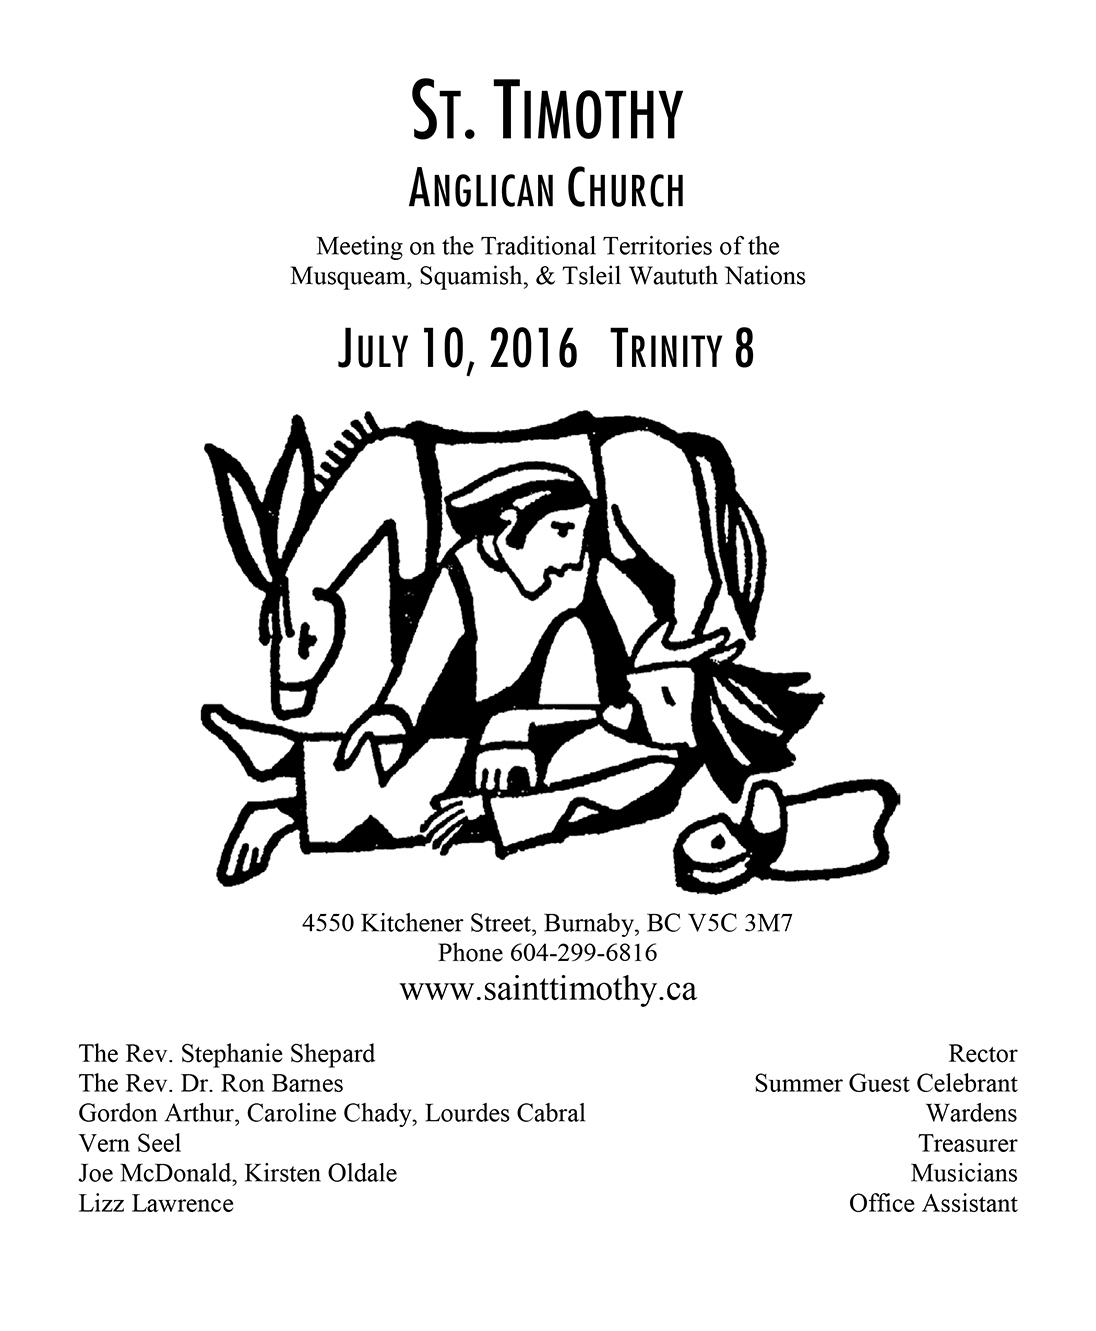 Bulletin: July 10, 2016